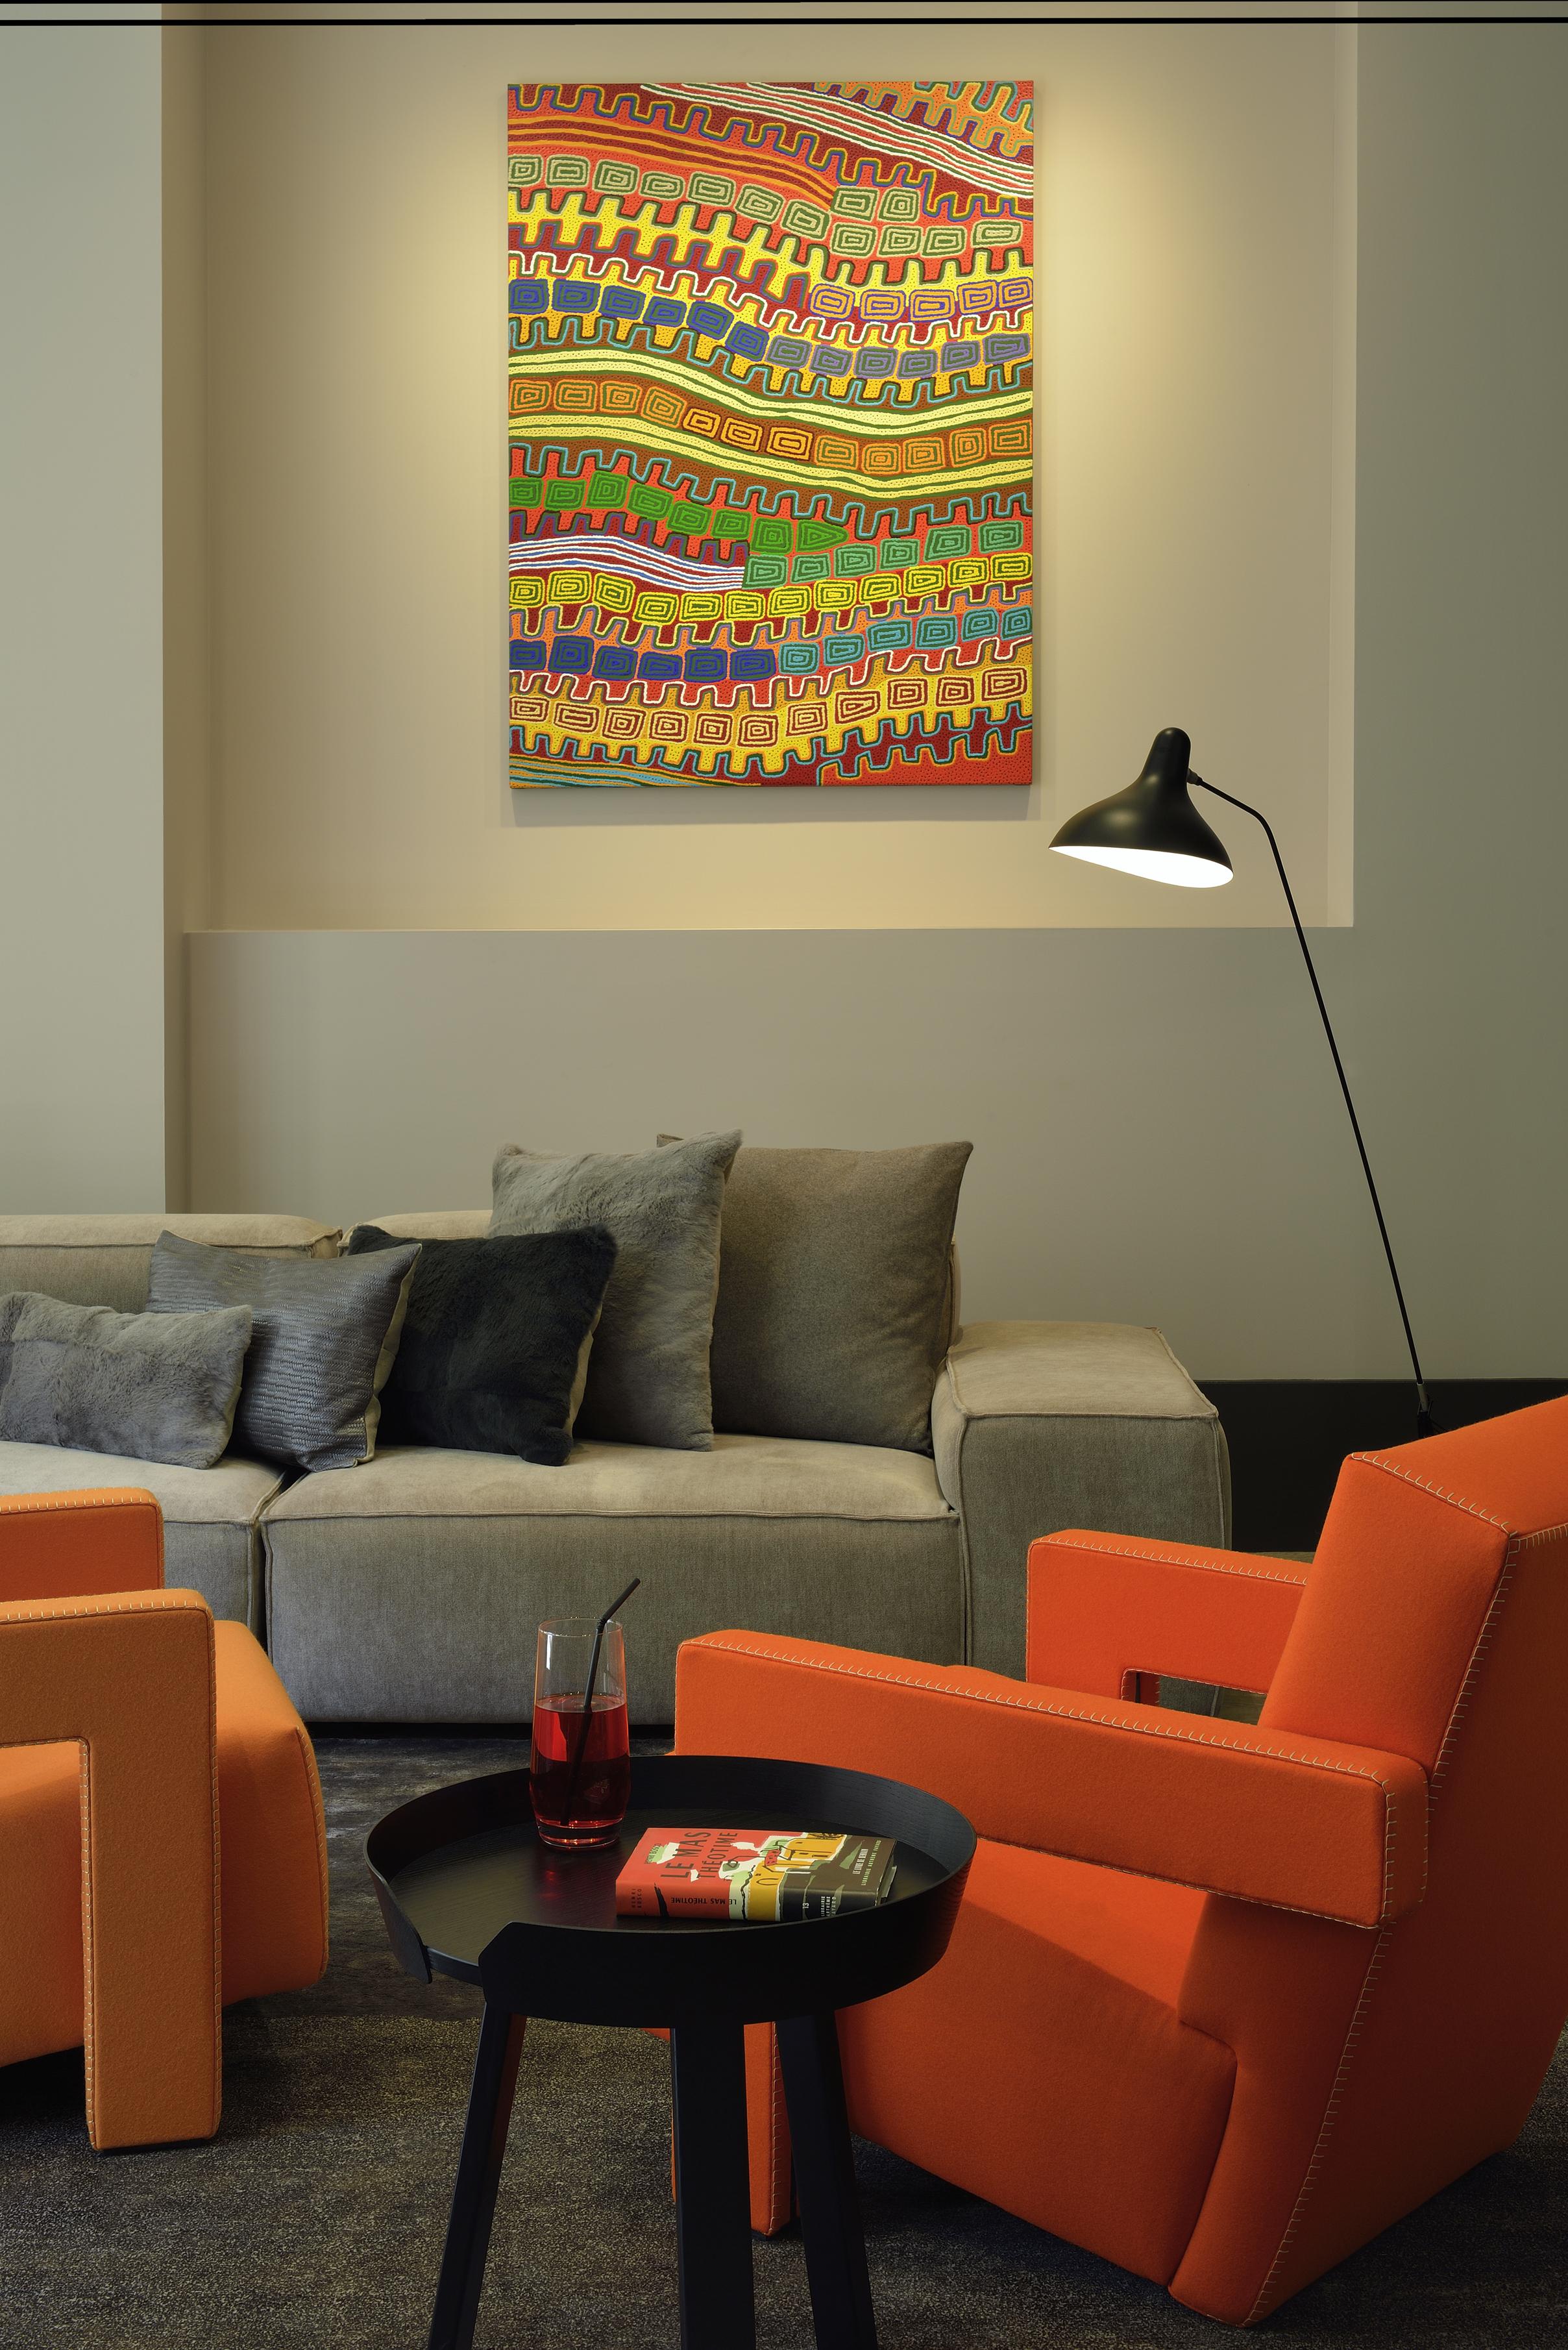 le balthazar h tel spa premier h tel de luxe rennes. Black Bedroom Furniture Sets. Home Design Ideas